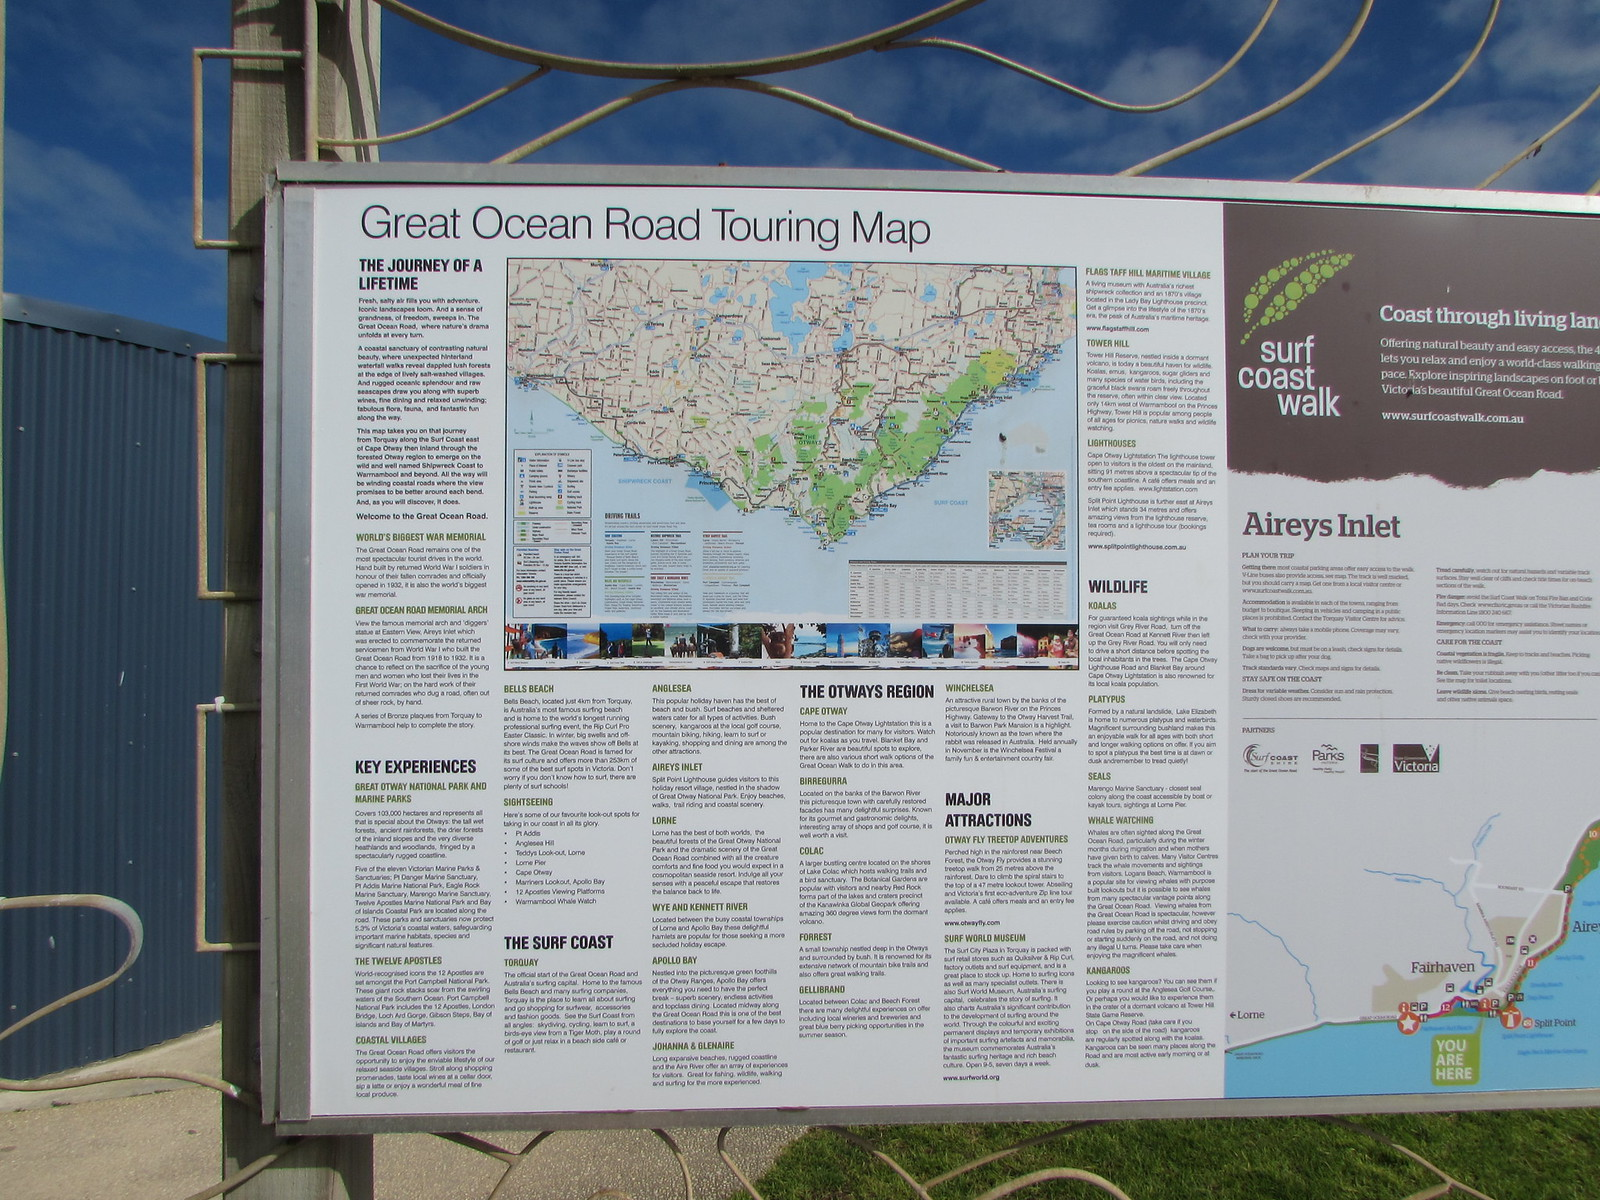 GOR Touring Map